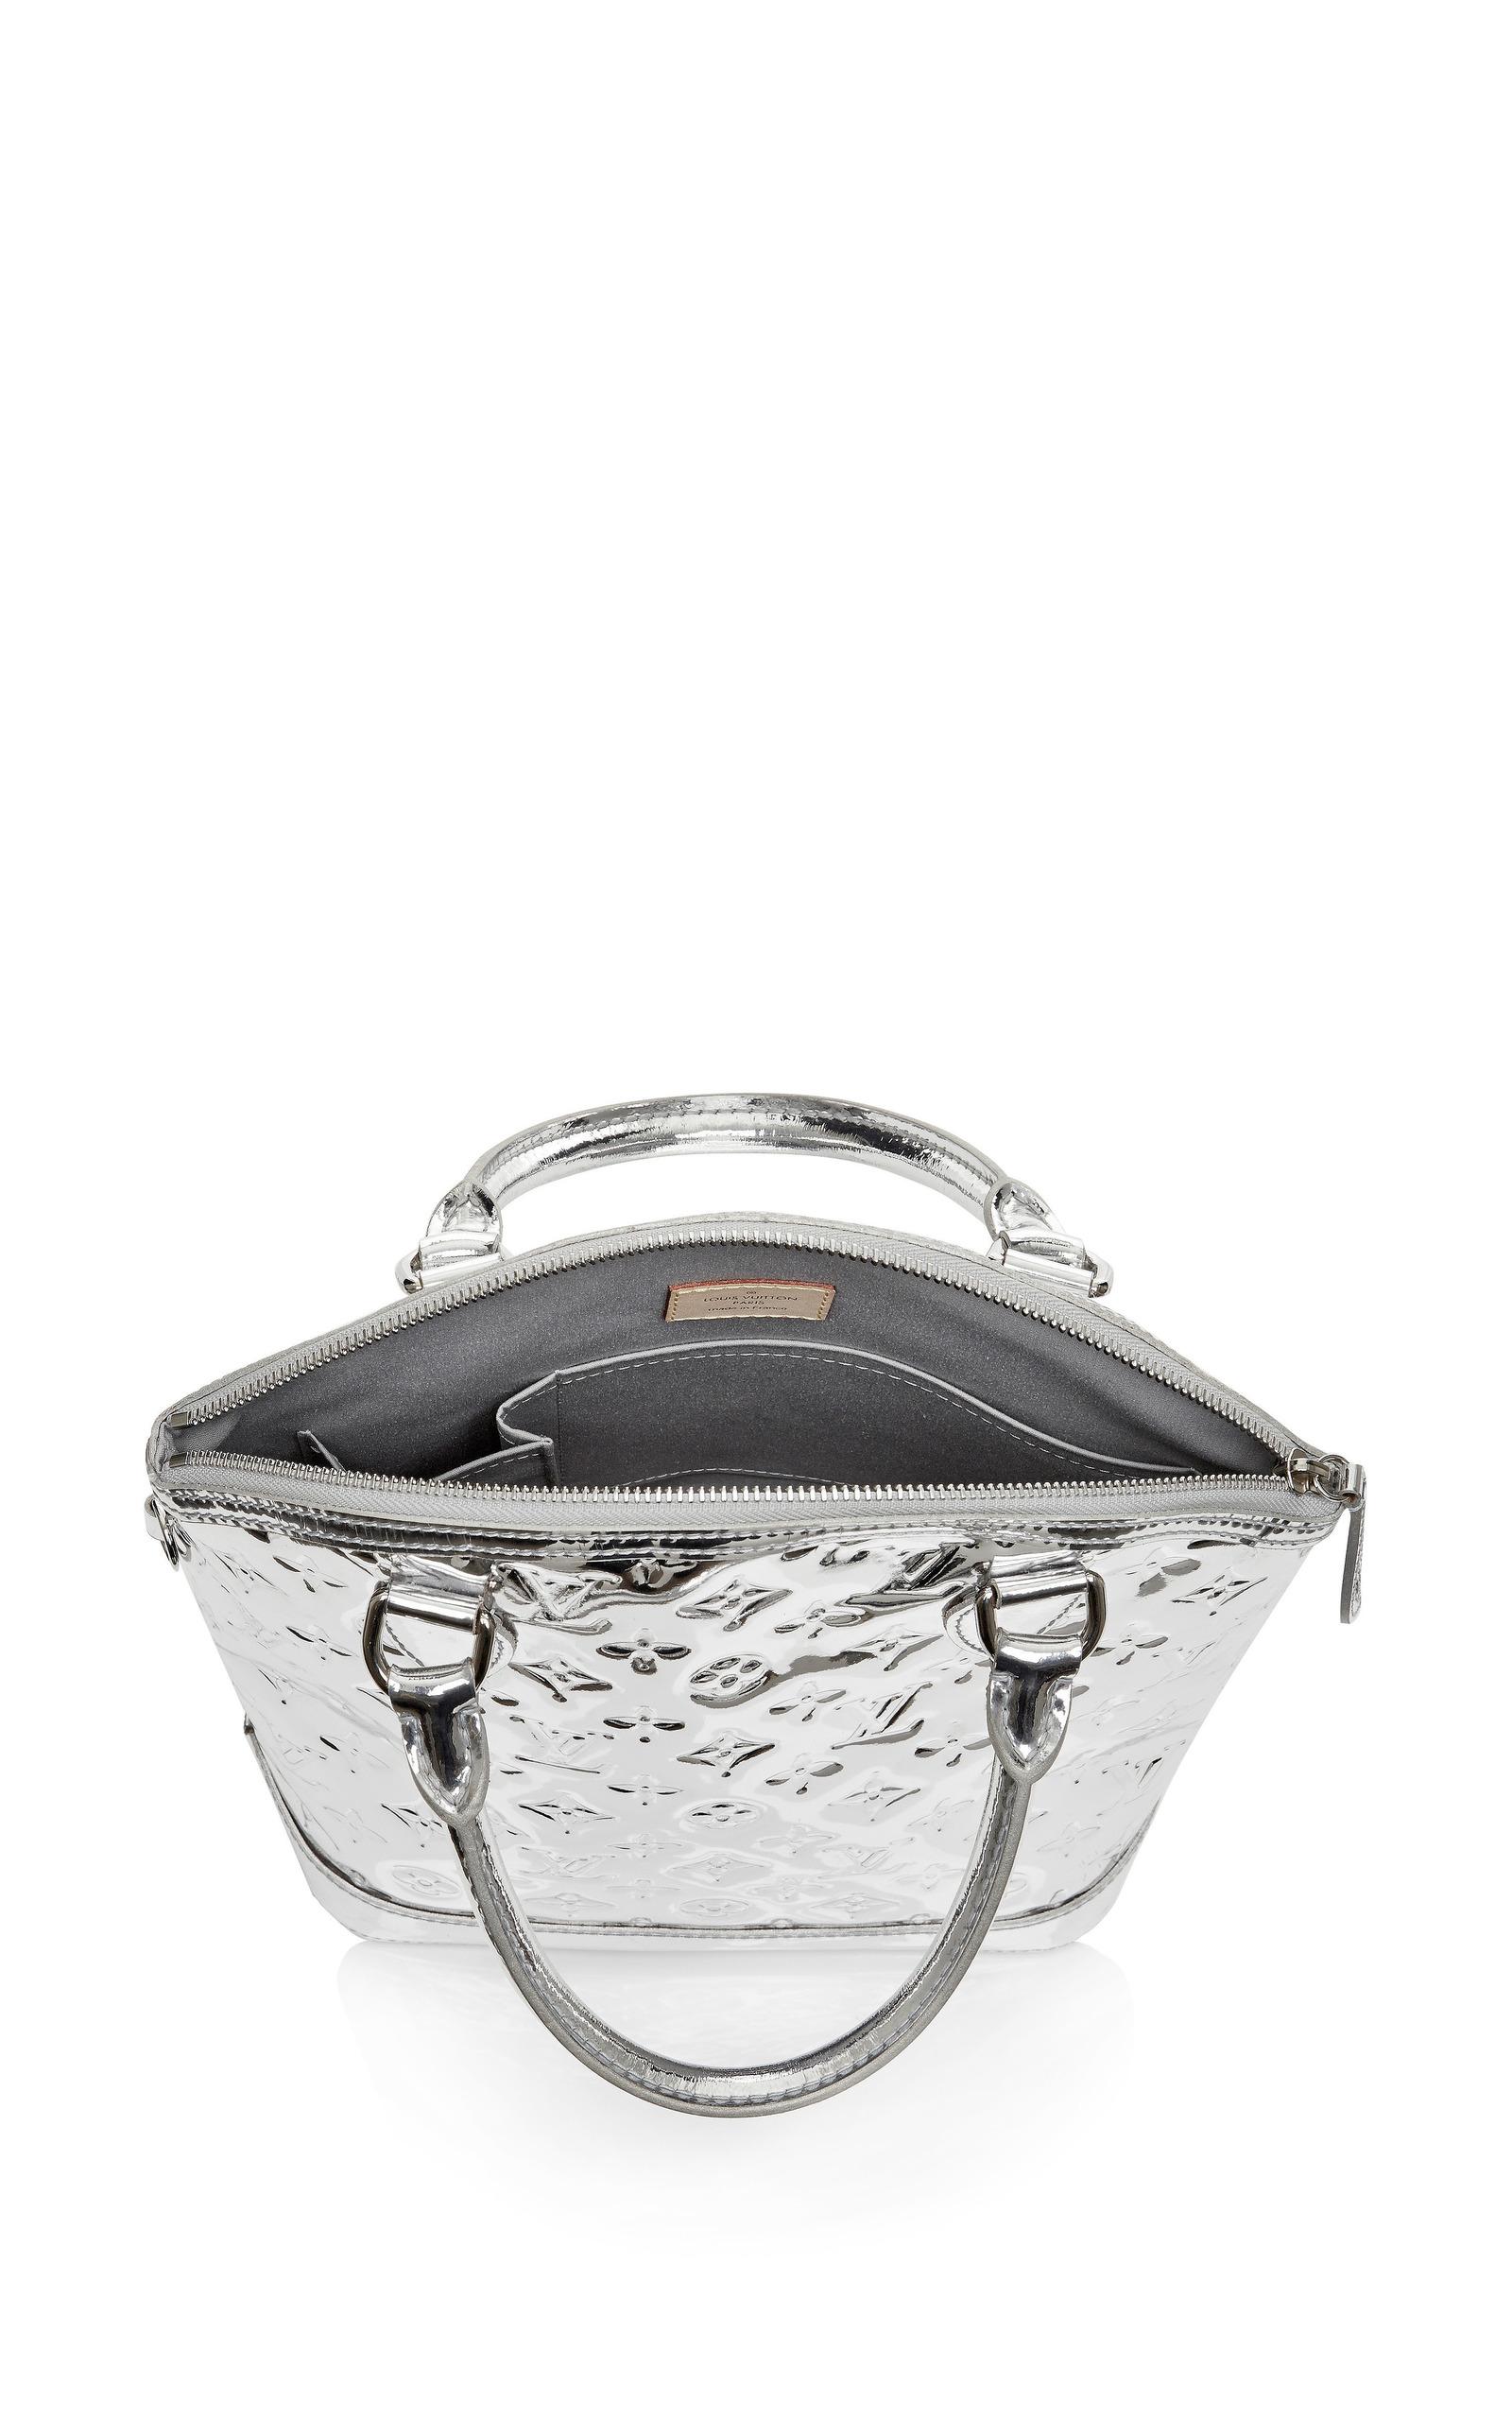 vintage louis vuitton silver miroir lockit pm by what. Black Bedroom Furniture Sets. Home Design Ideas